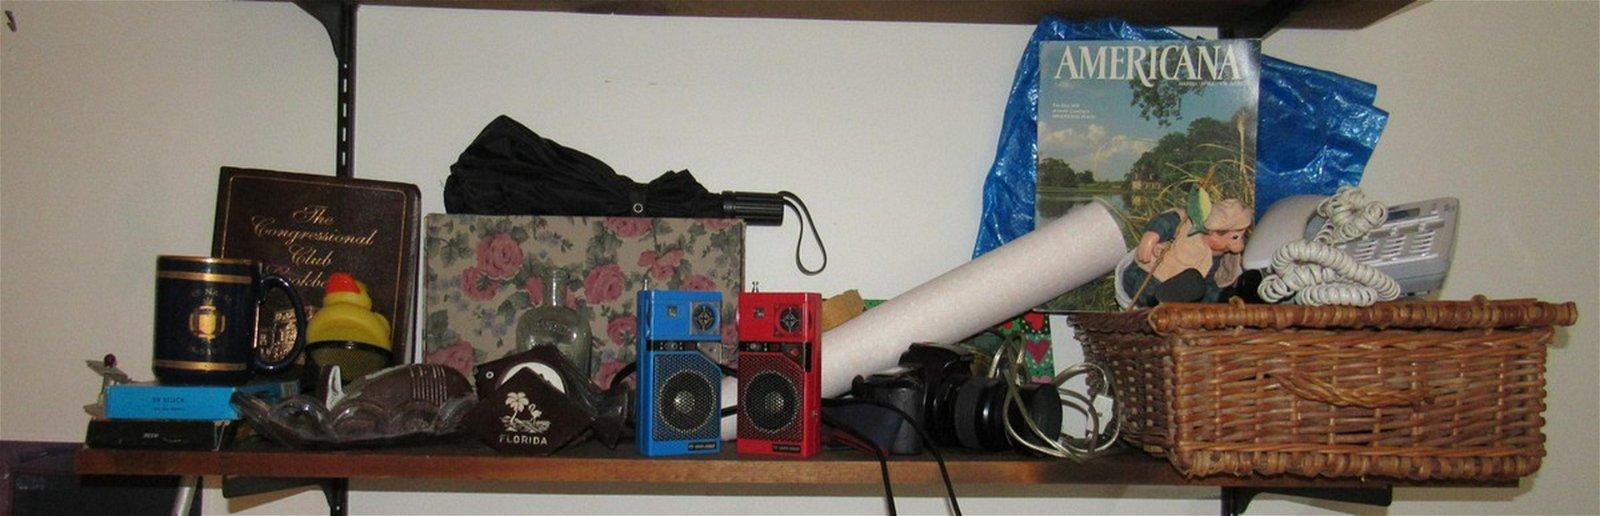 Contents of Shelf Cannon Camera Silver Crown Radios